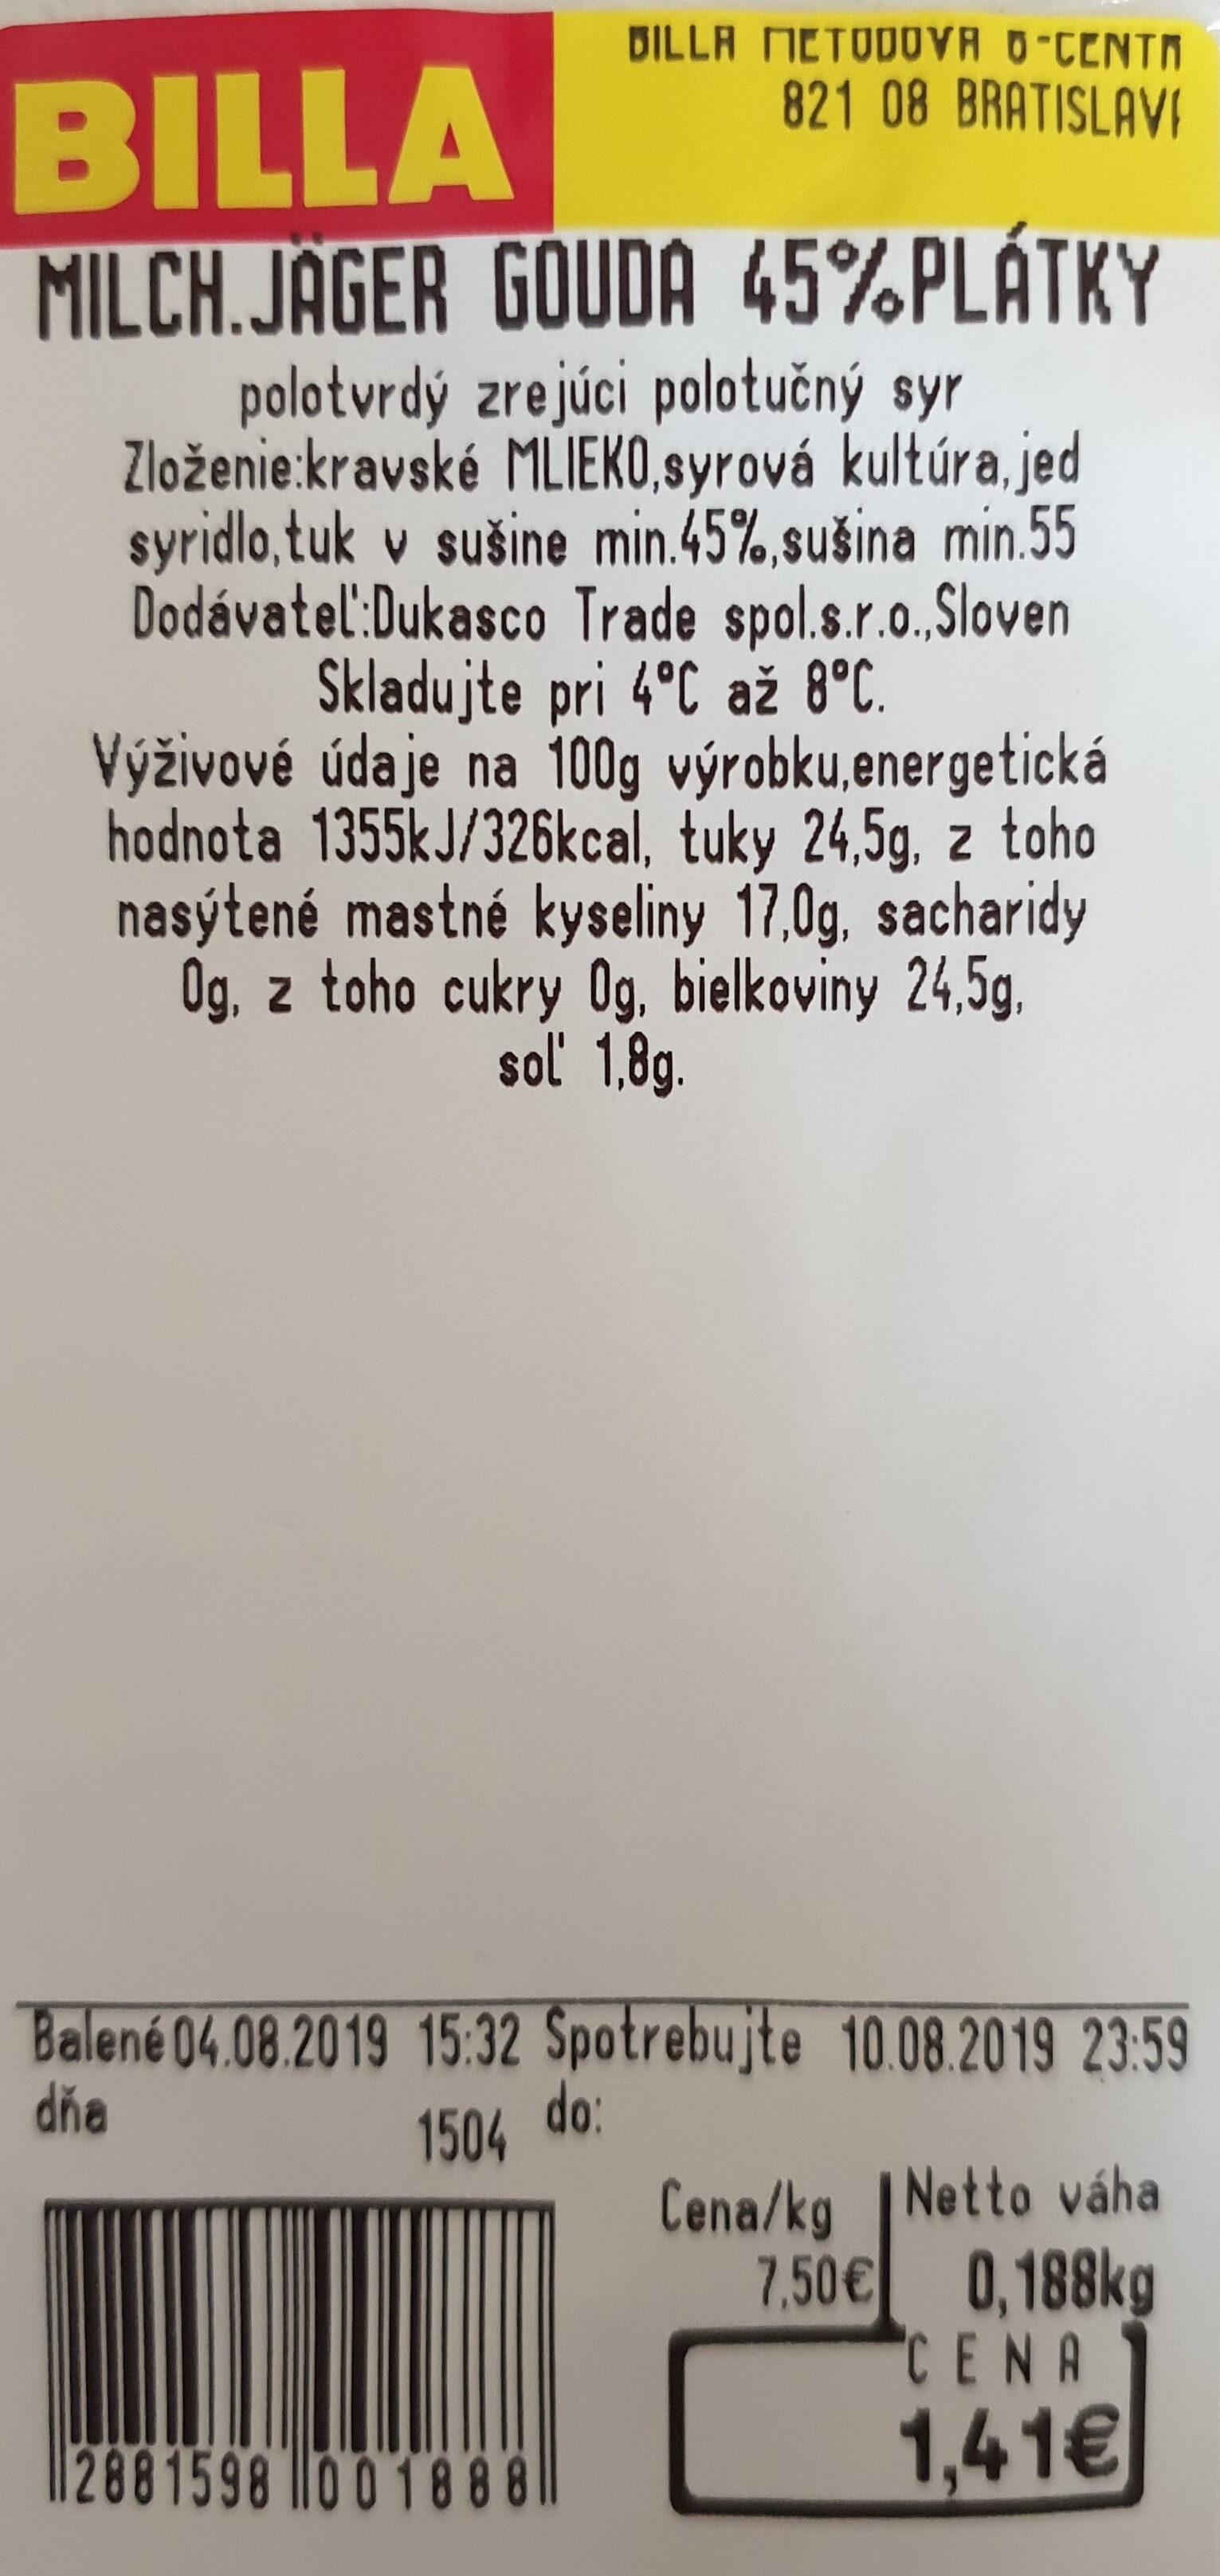 Milch.Jäger Gouda 45%plátky - Product - sk